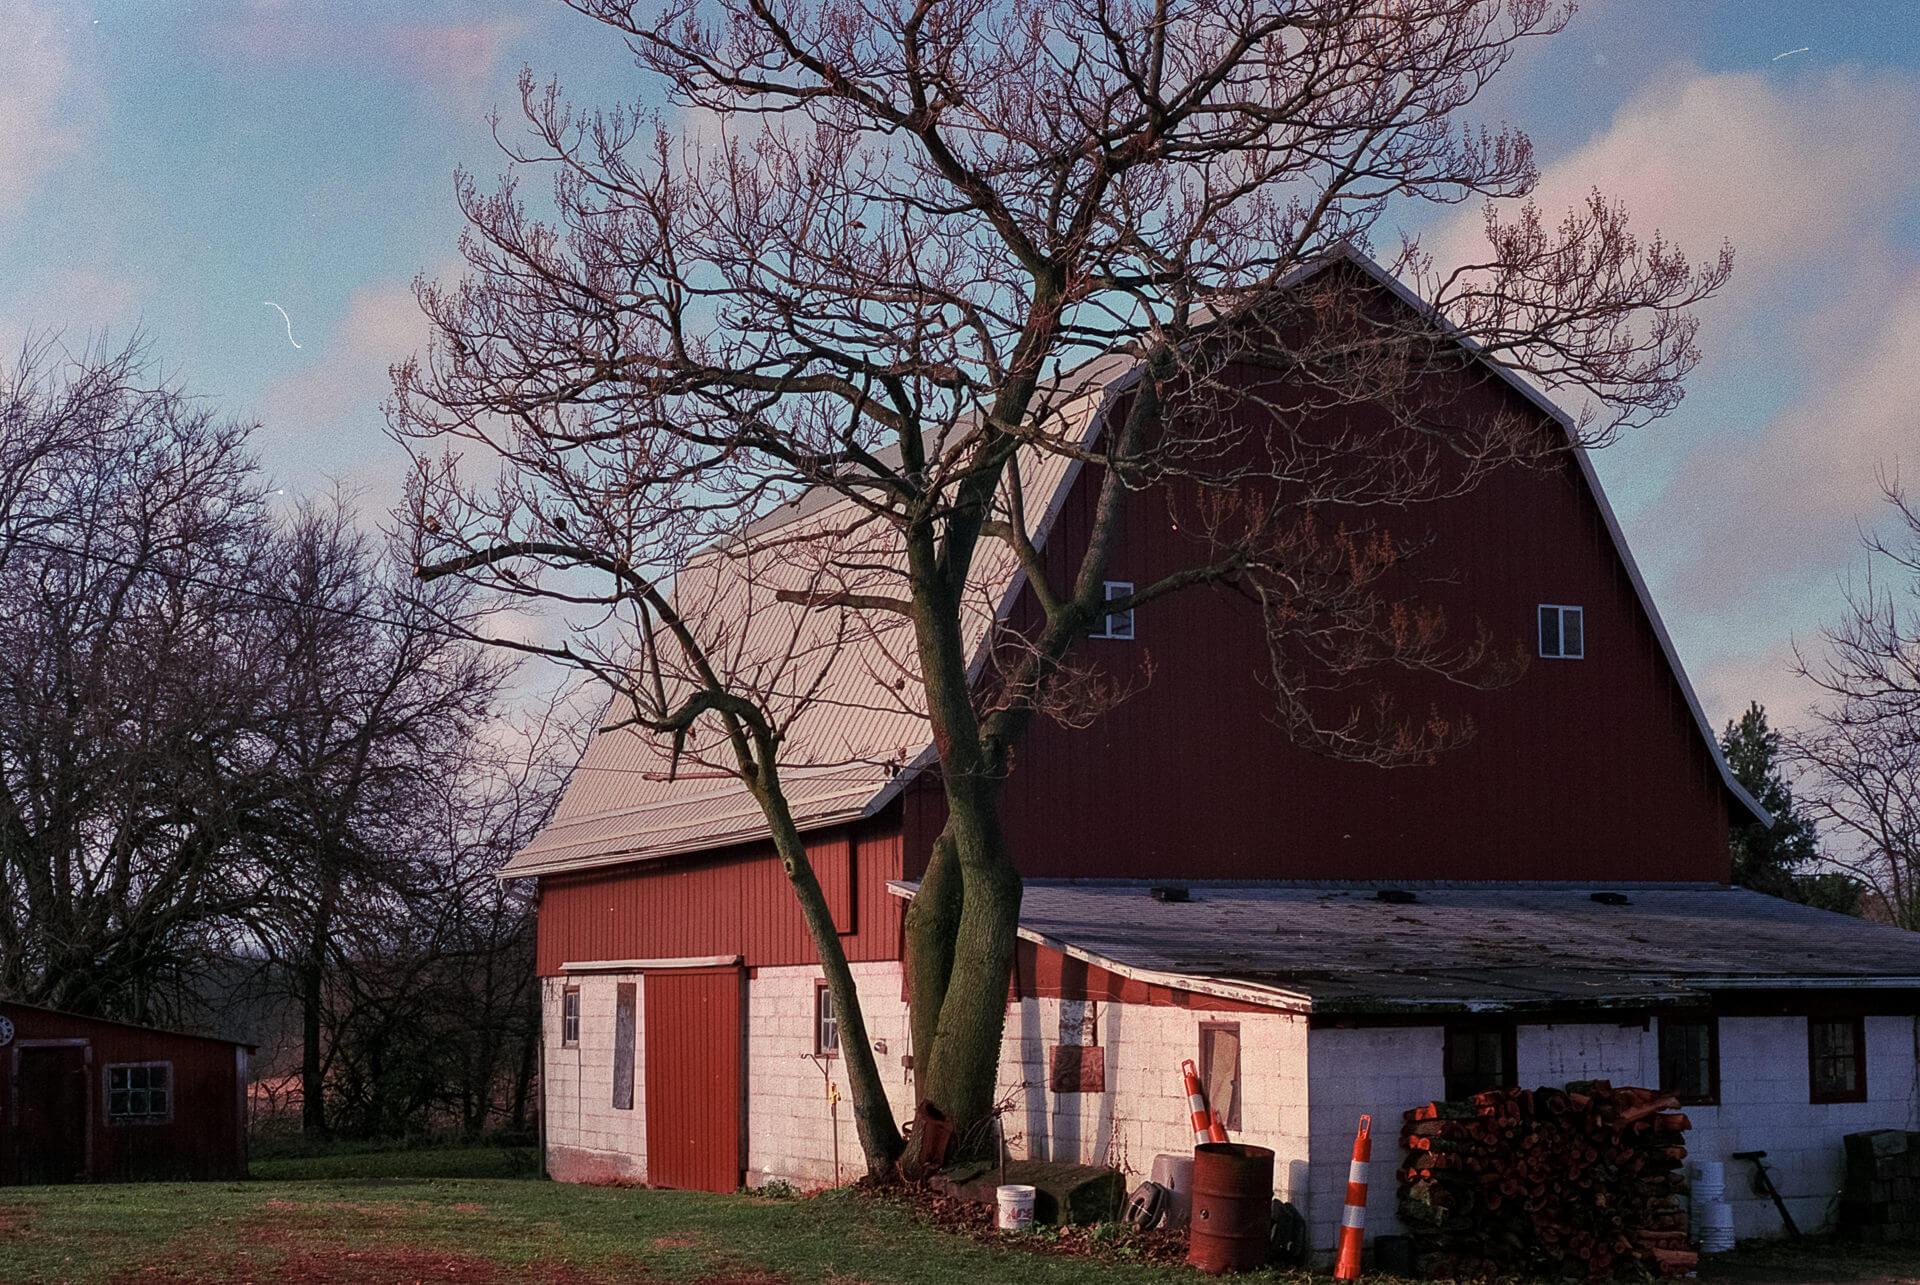 Barn in Mechanicsburg OH